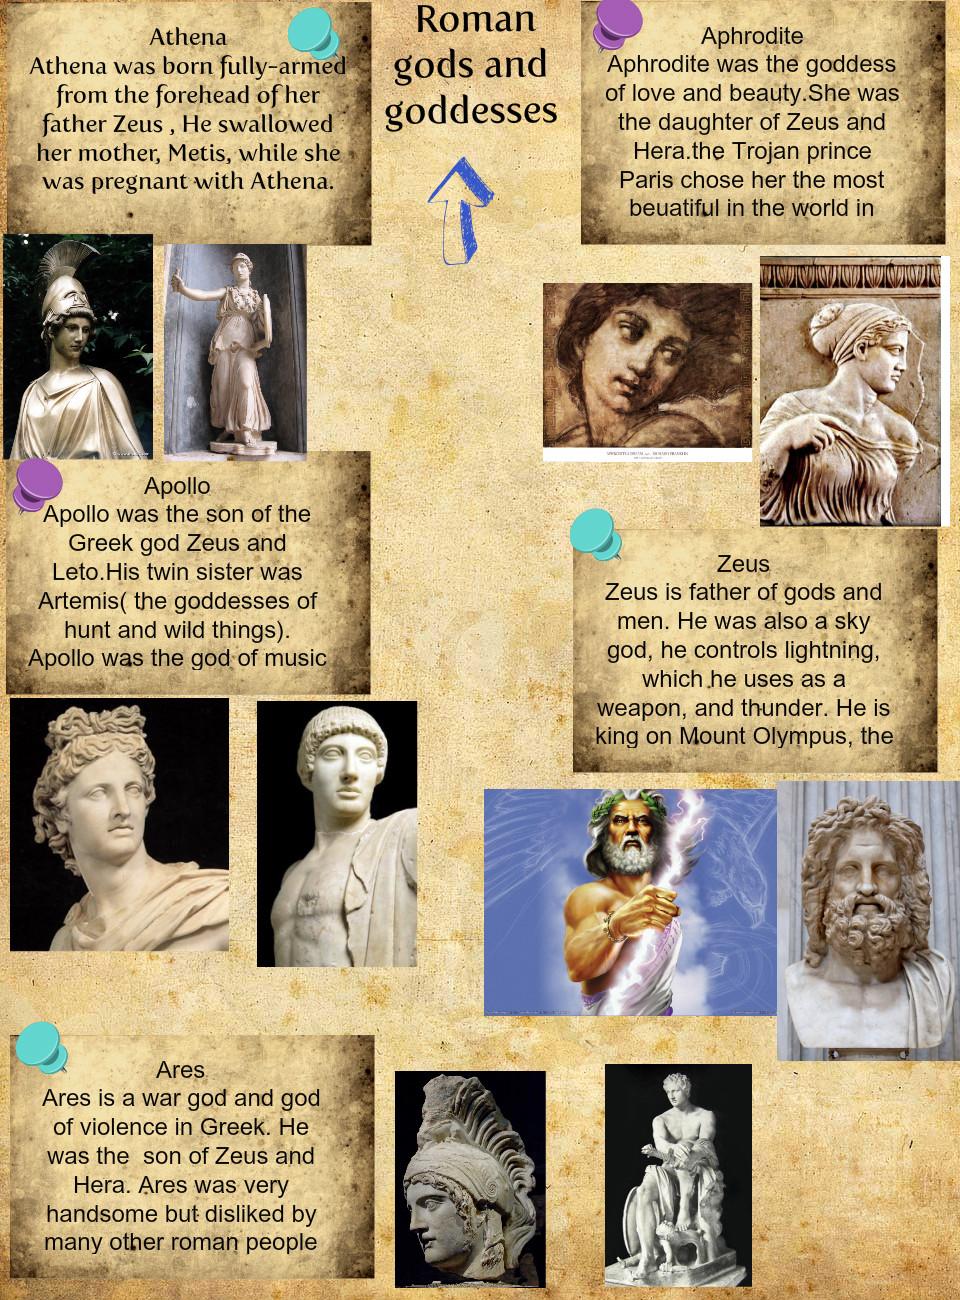 roman-gods-and-goddesses-source